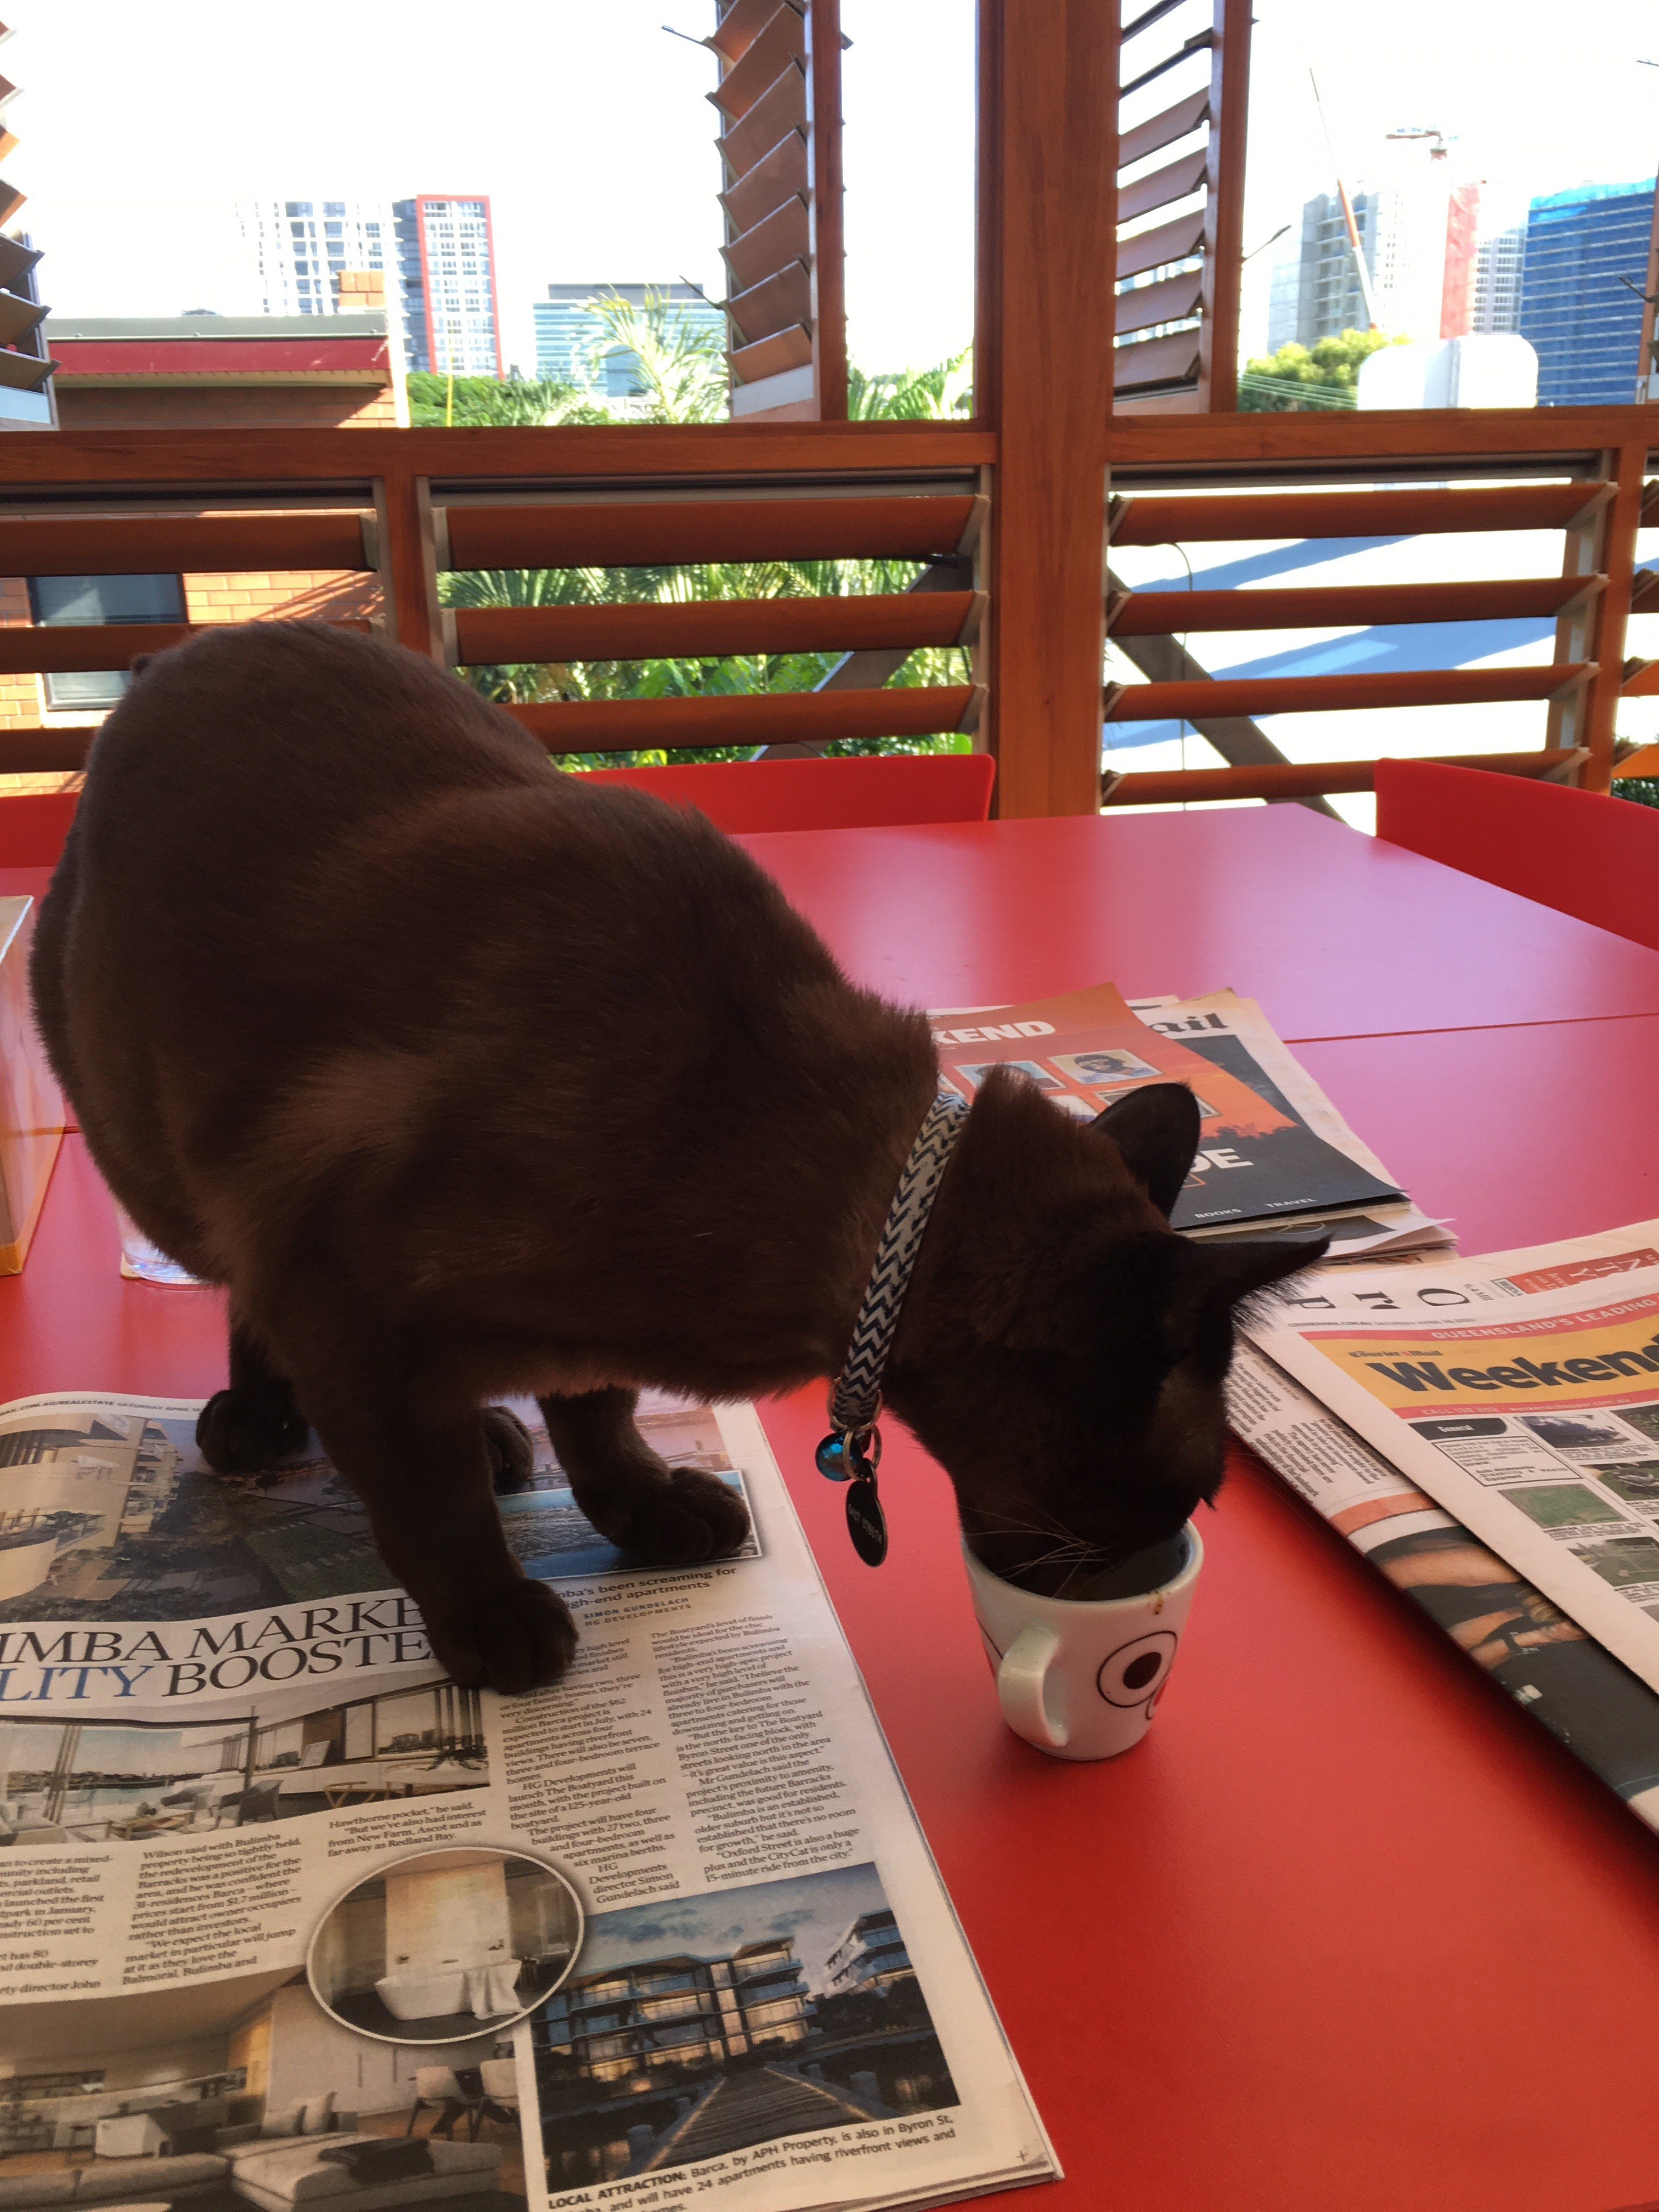 Albert drinking some milk